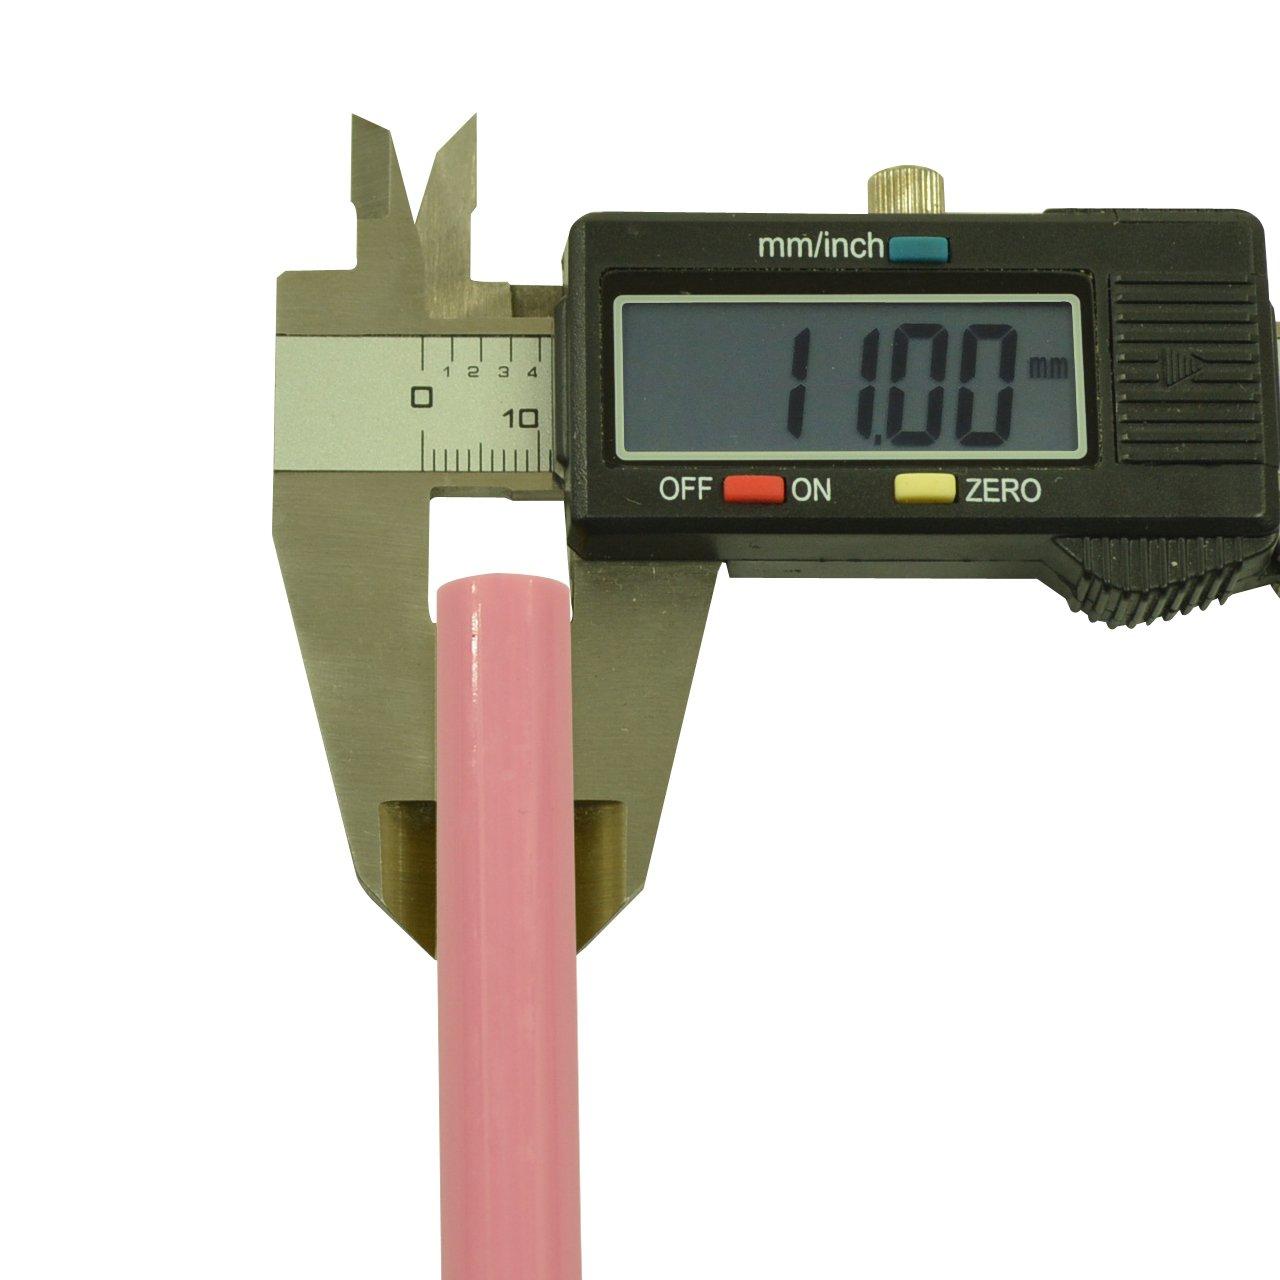 GlueSticksDirect Pink Colored Glue Sticks 7/16'' X 4'' 5 lbs by GlueSticksDirect.com (Image #4)